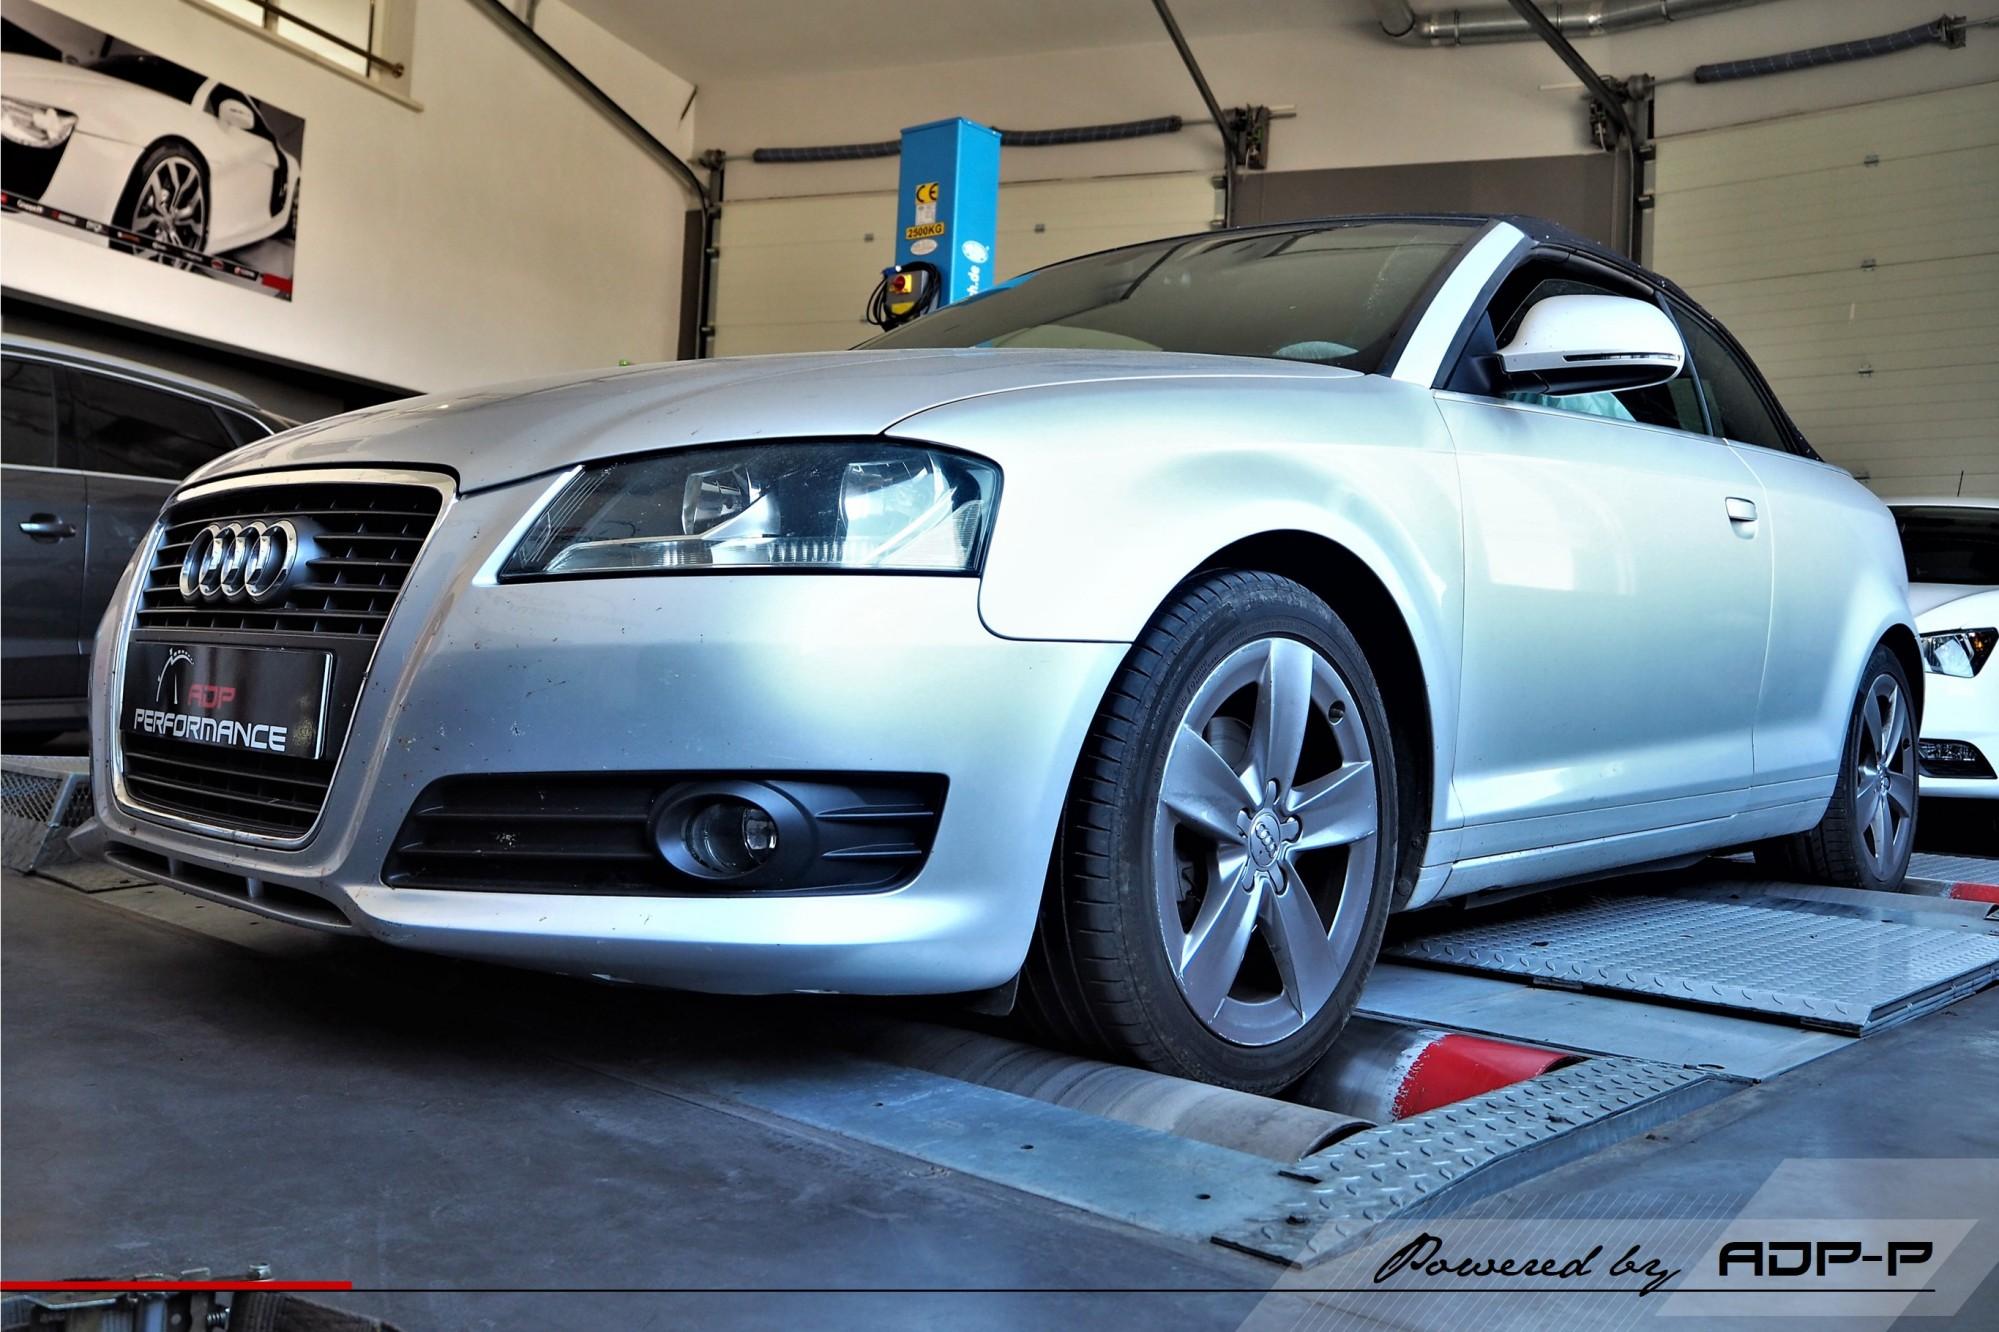 Reprogrammation moteur Aix en Provence, Aubagne, Marseille - Audi A3 8P Mk2 1.8 TFSI 160cv - ADP Performance